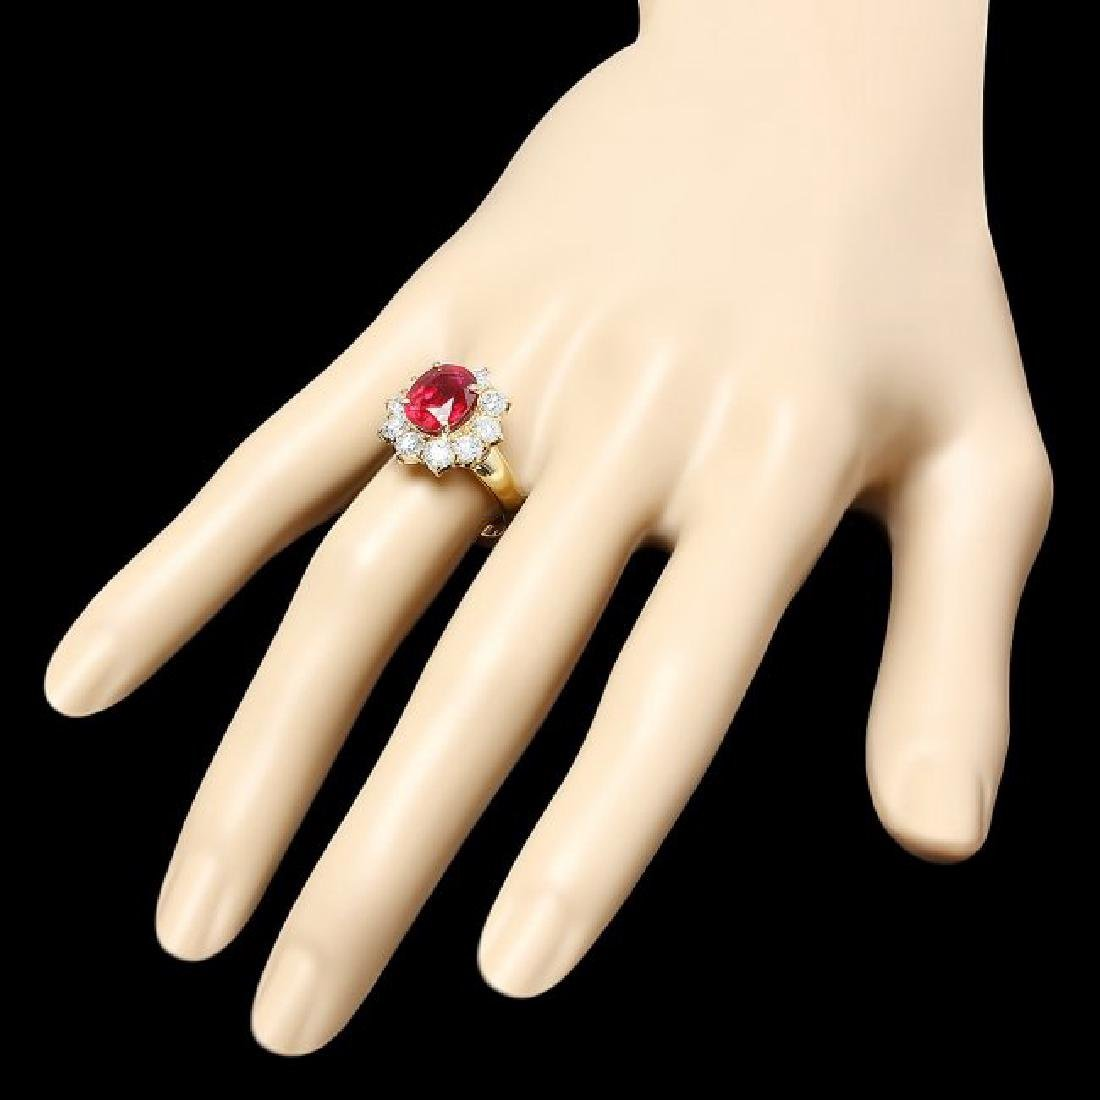 14k Yellow Gold 4.66ct Ruby 1.74ct Diamond Ring - 3